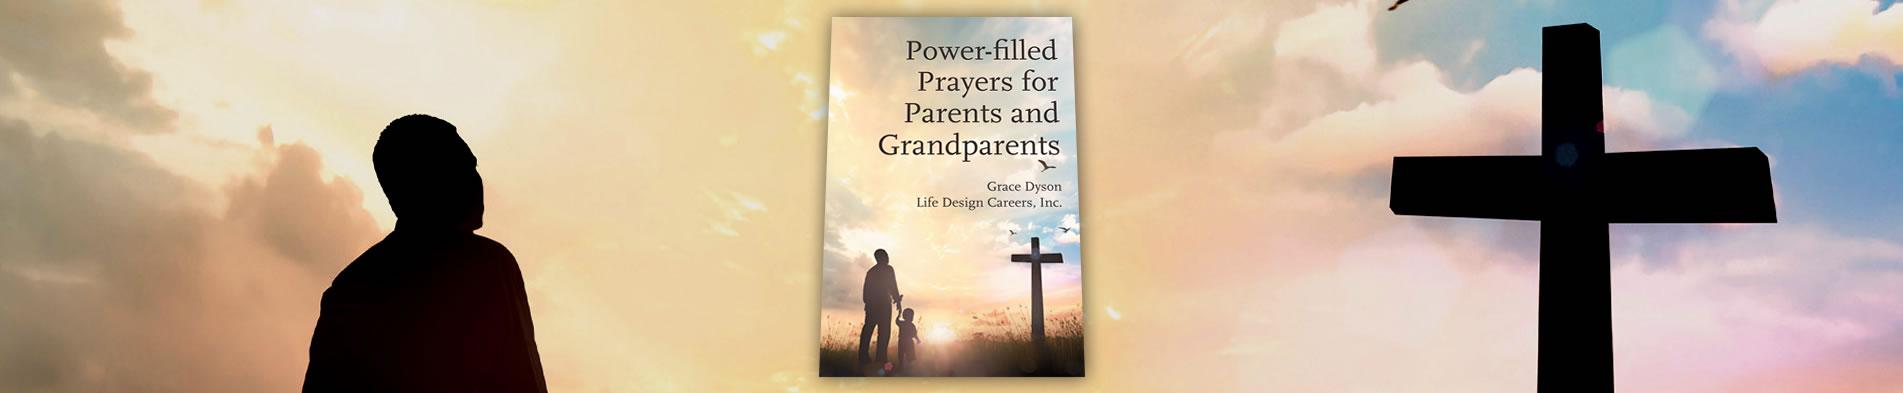 Power-Filled Prayers